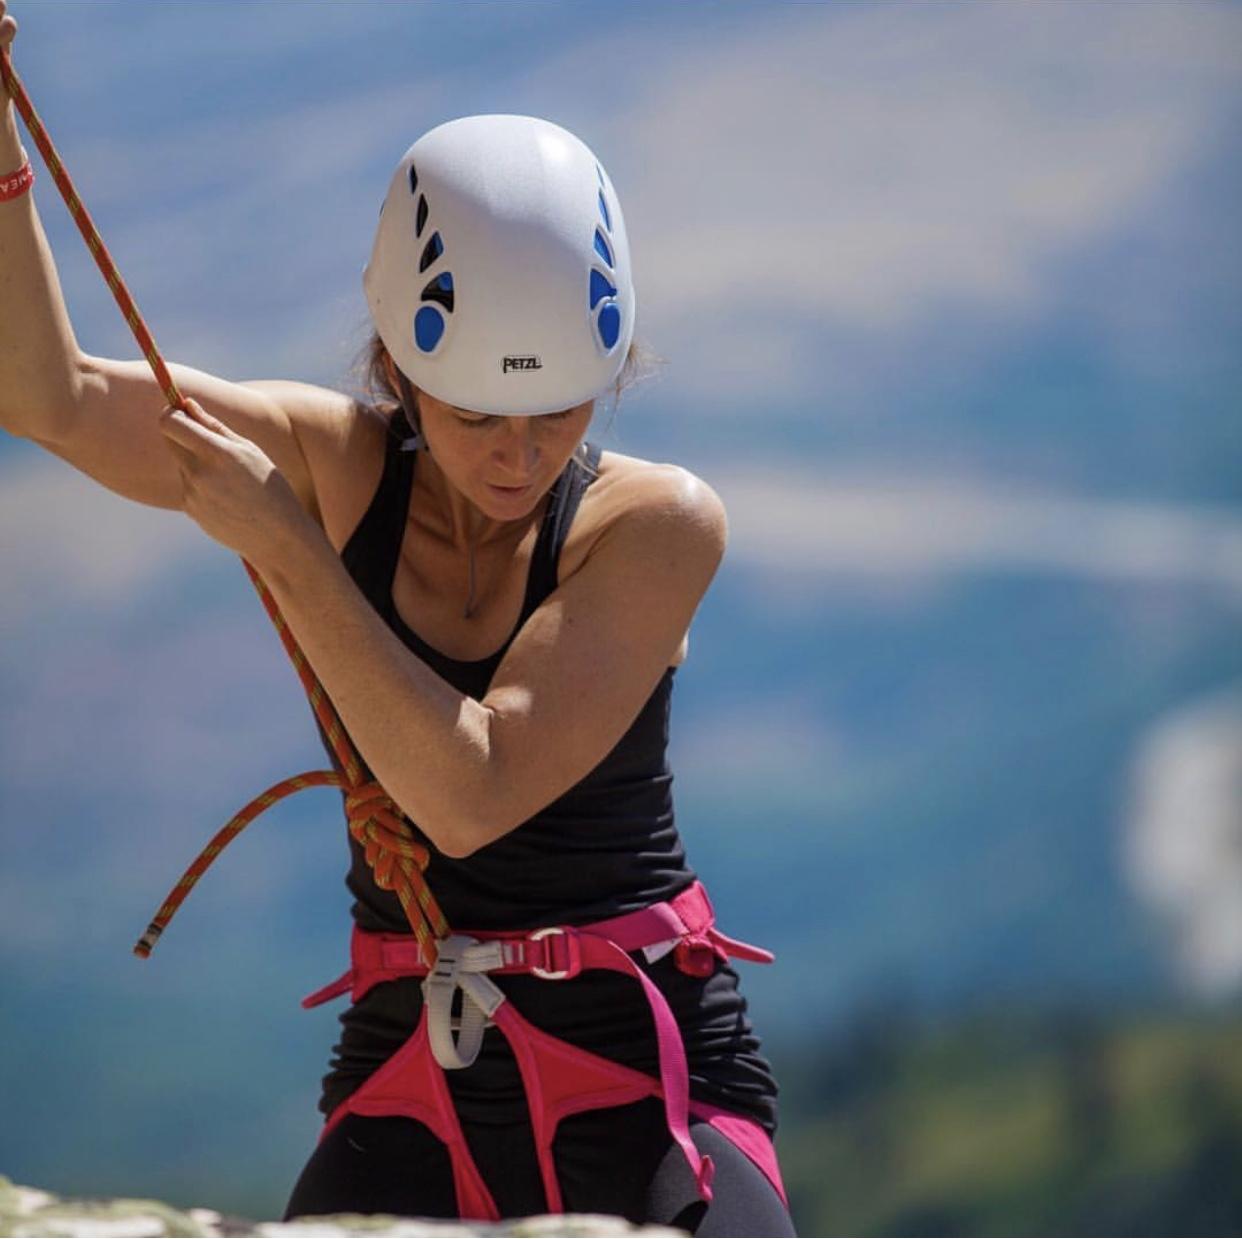 Stephanie-Kemp-climbing.jpg